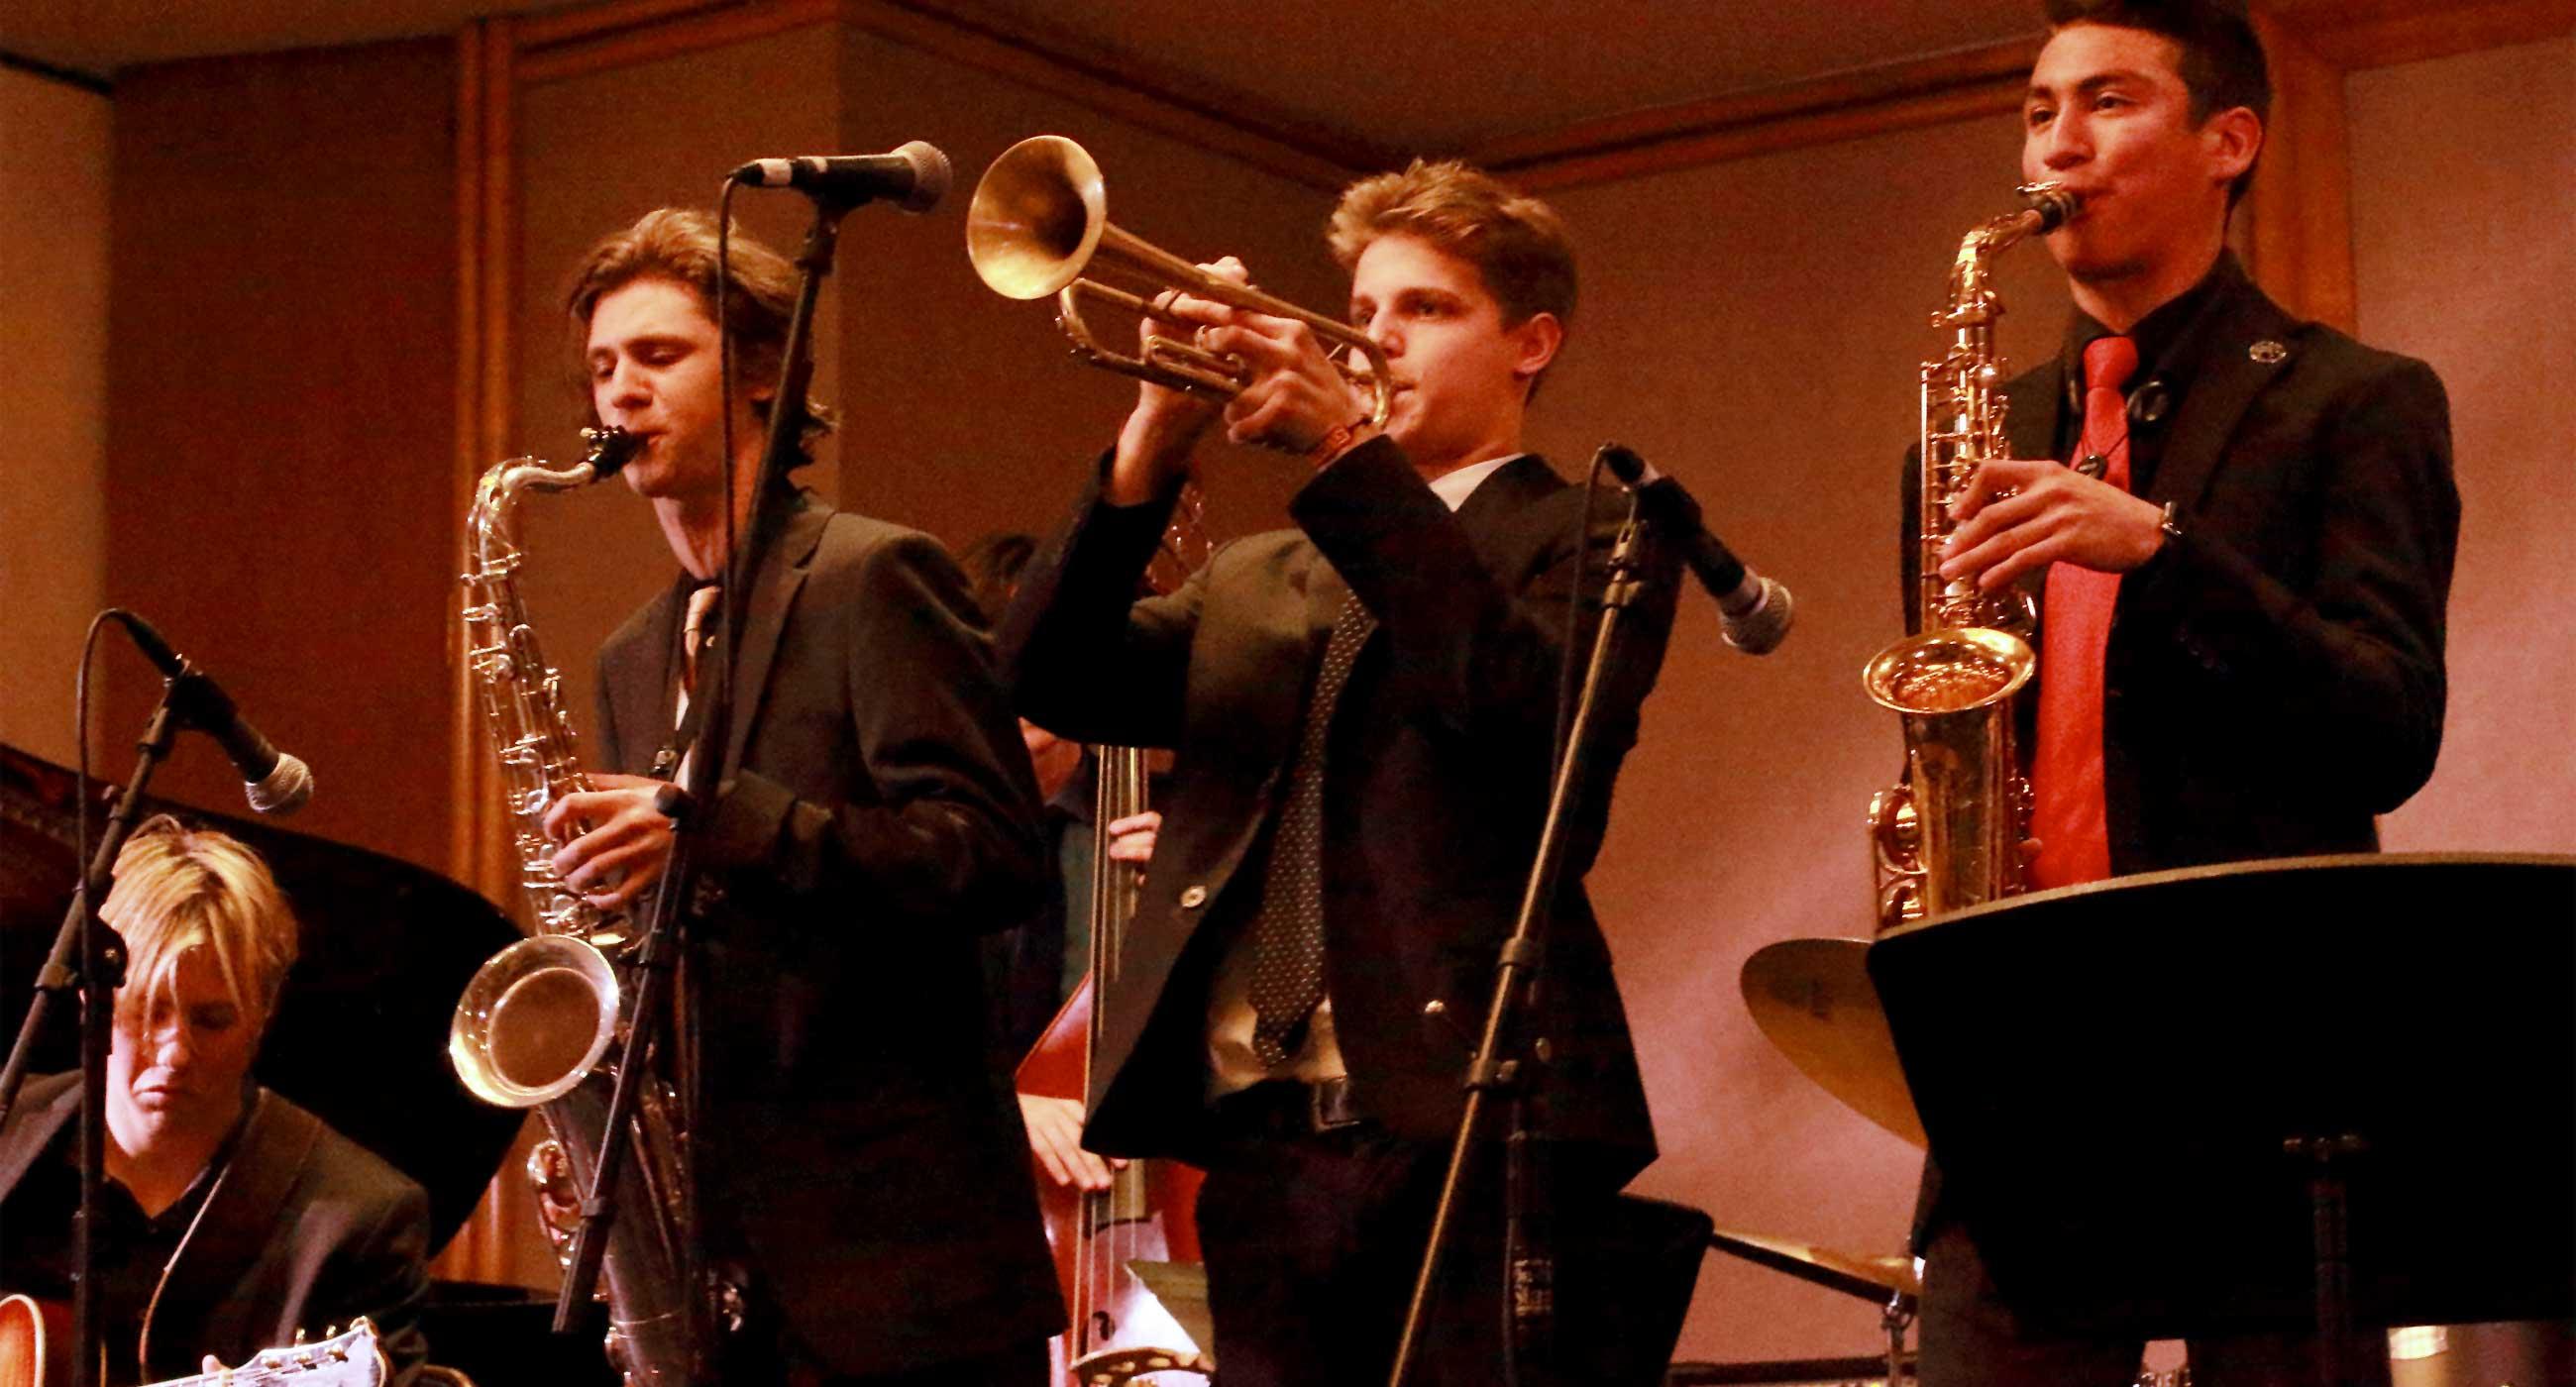 Jazz Students and Ensembles Win DownBeat Awards - Colburn